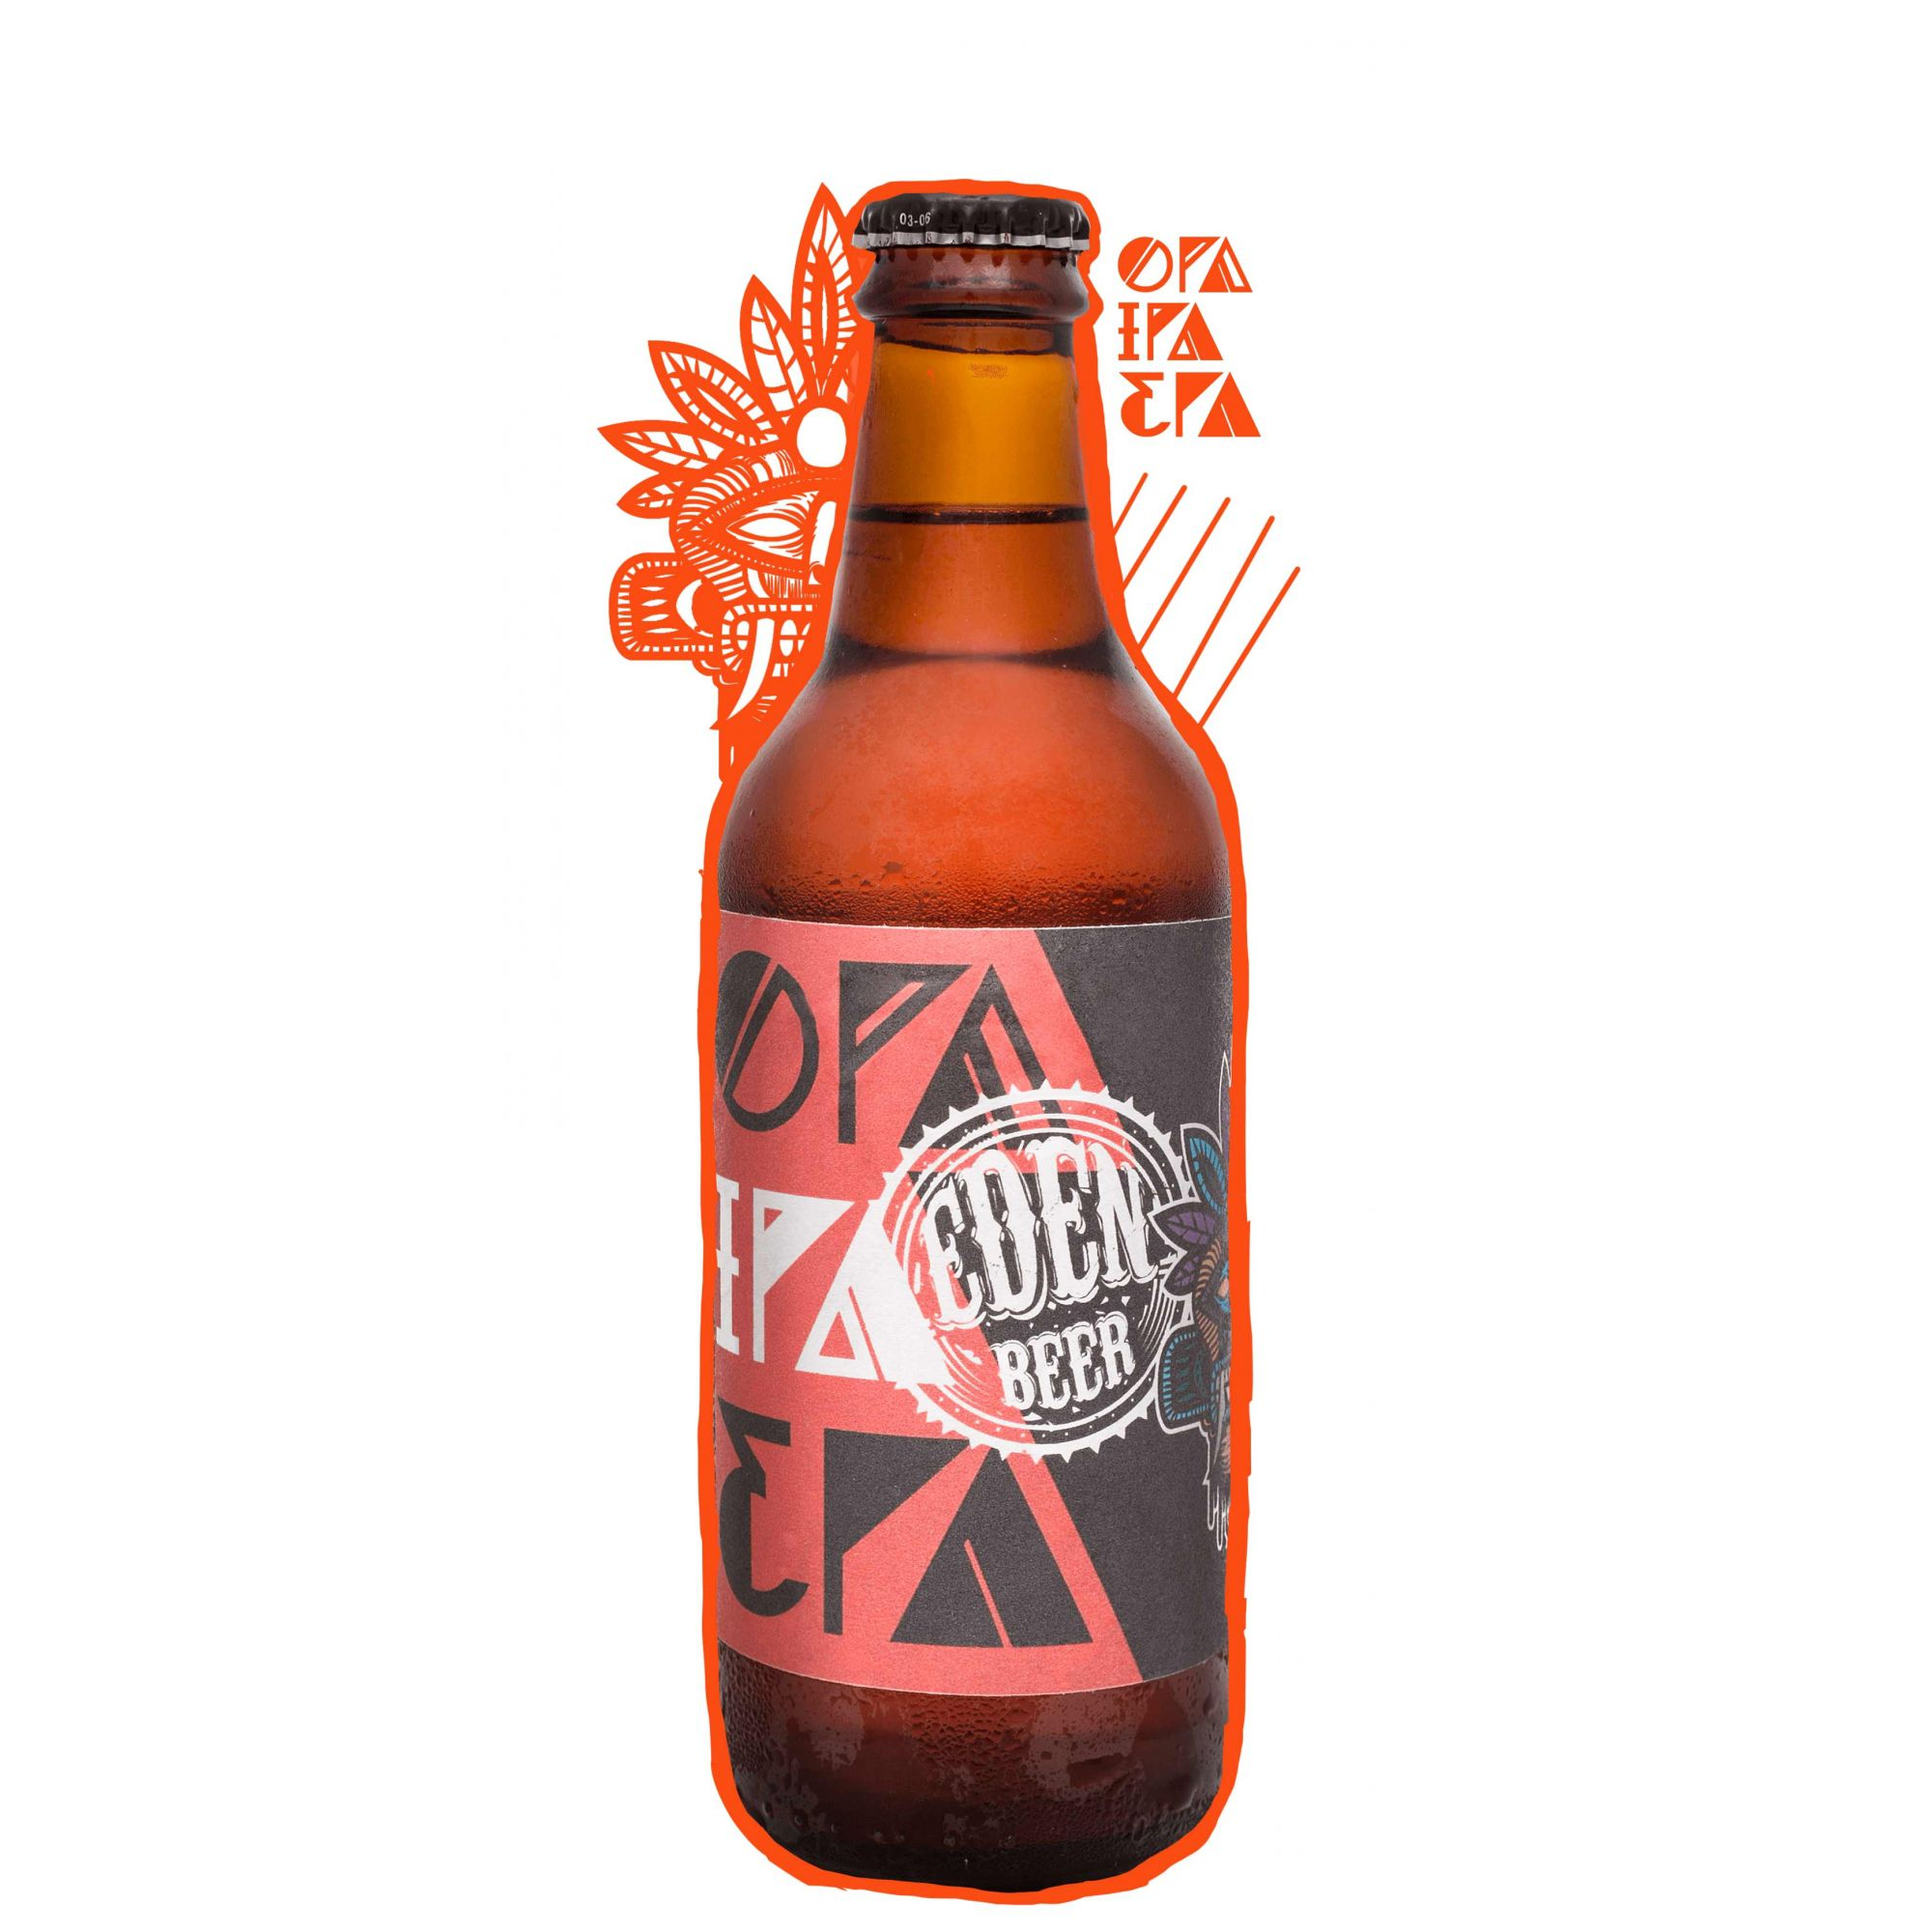 Cerveja Artesanal IPA Eden Beer 330ml - Puro Malte - OPA IPA EPA